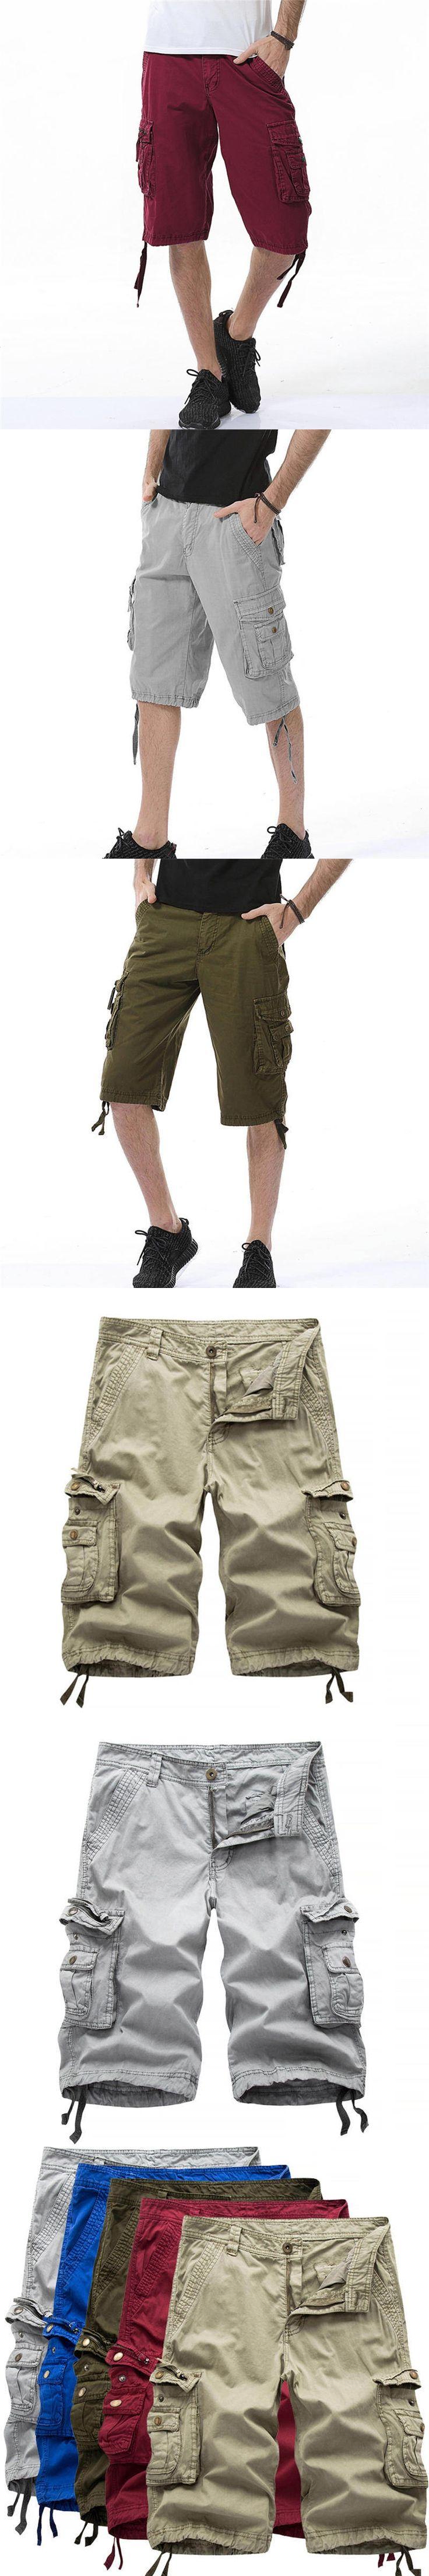 Plus Size Mens Shorts Summer Half Short Lightweight Cargo Combat Shorts Cropped Soft Multi Pocket Summer Men Clothing 0331